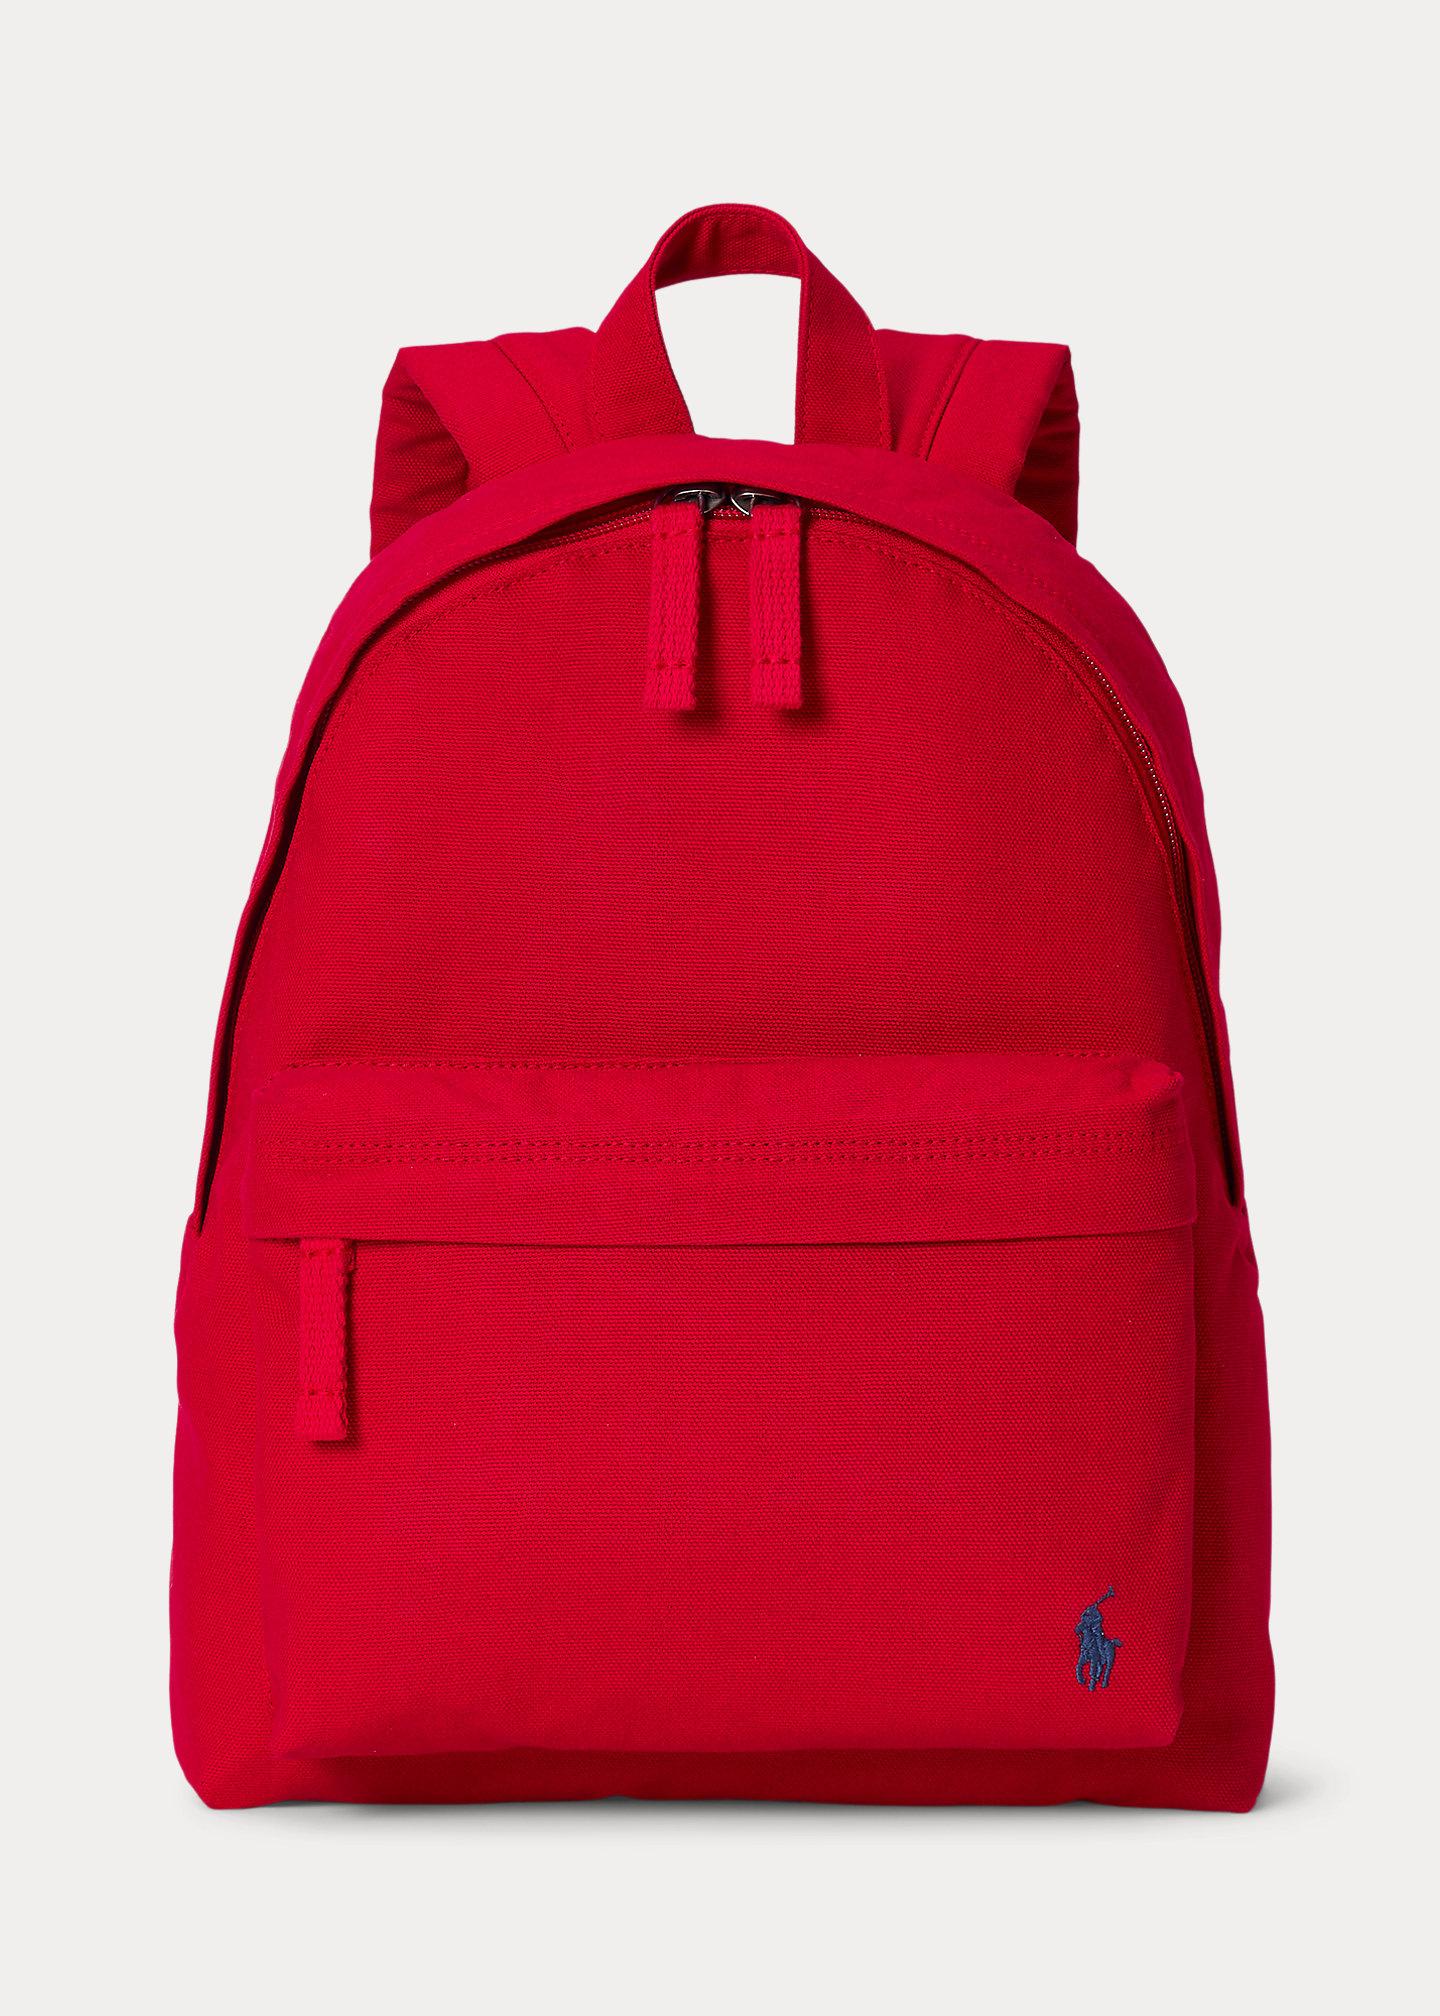 Polo Ralph Lauren Big Pony Canvas Backpack